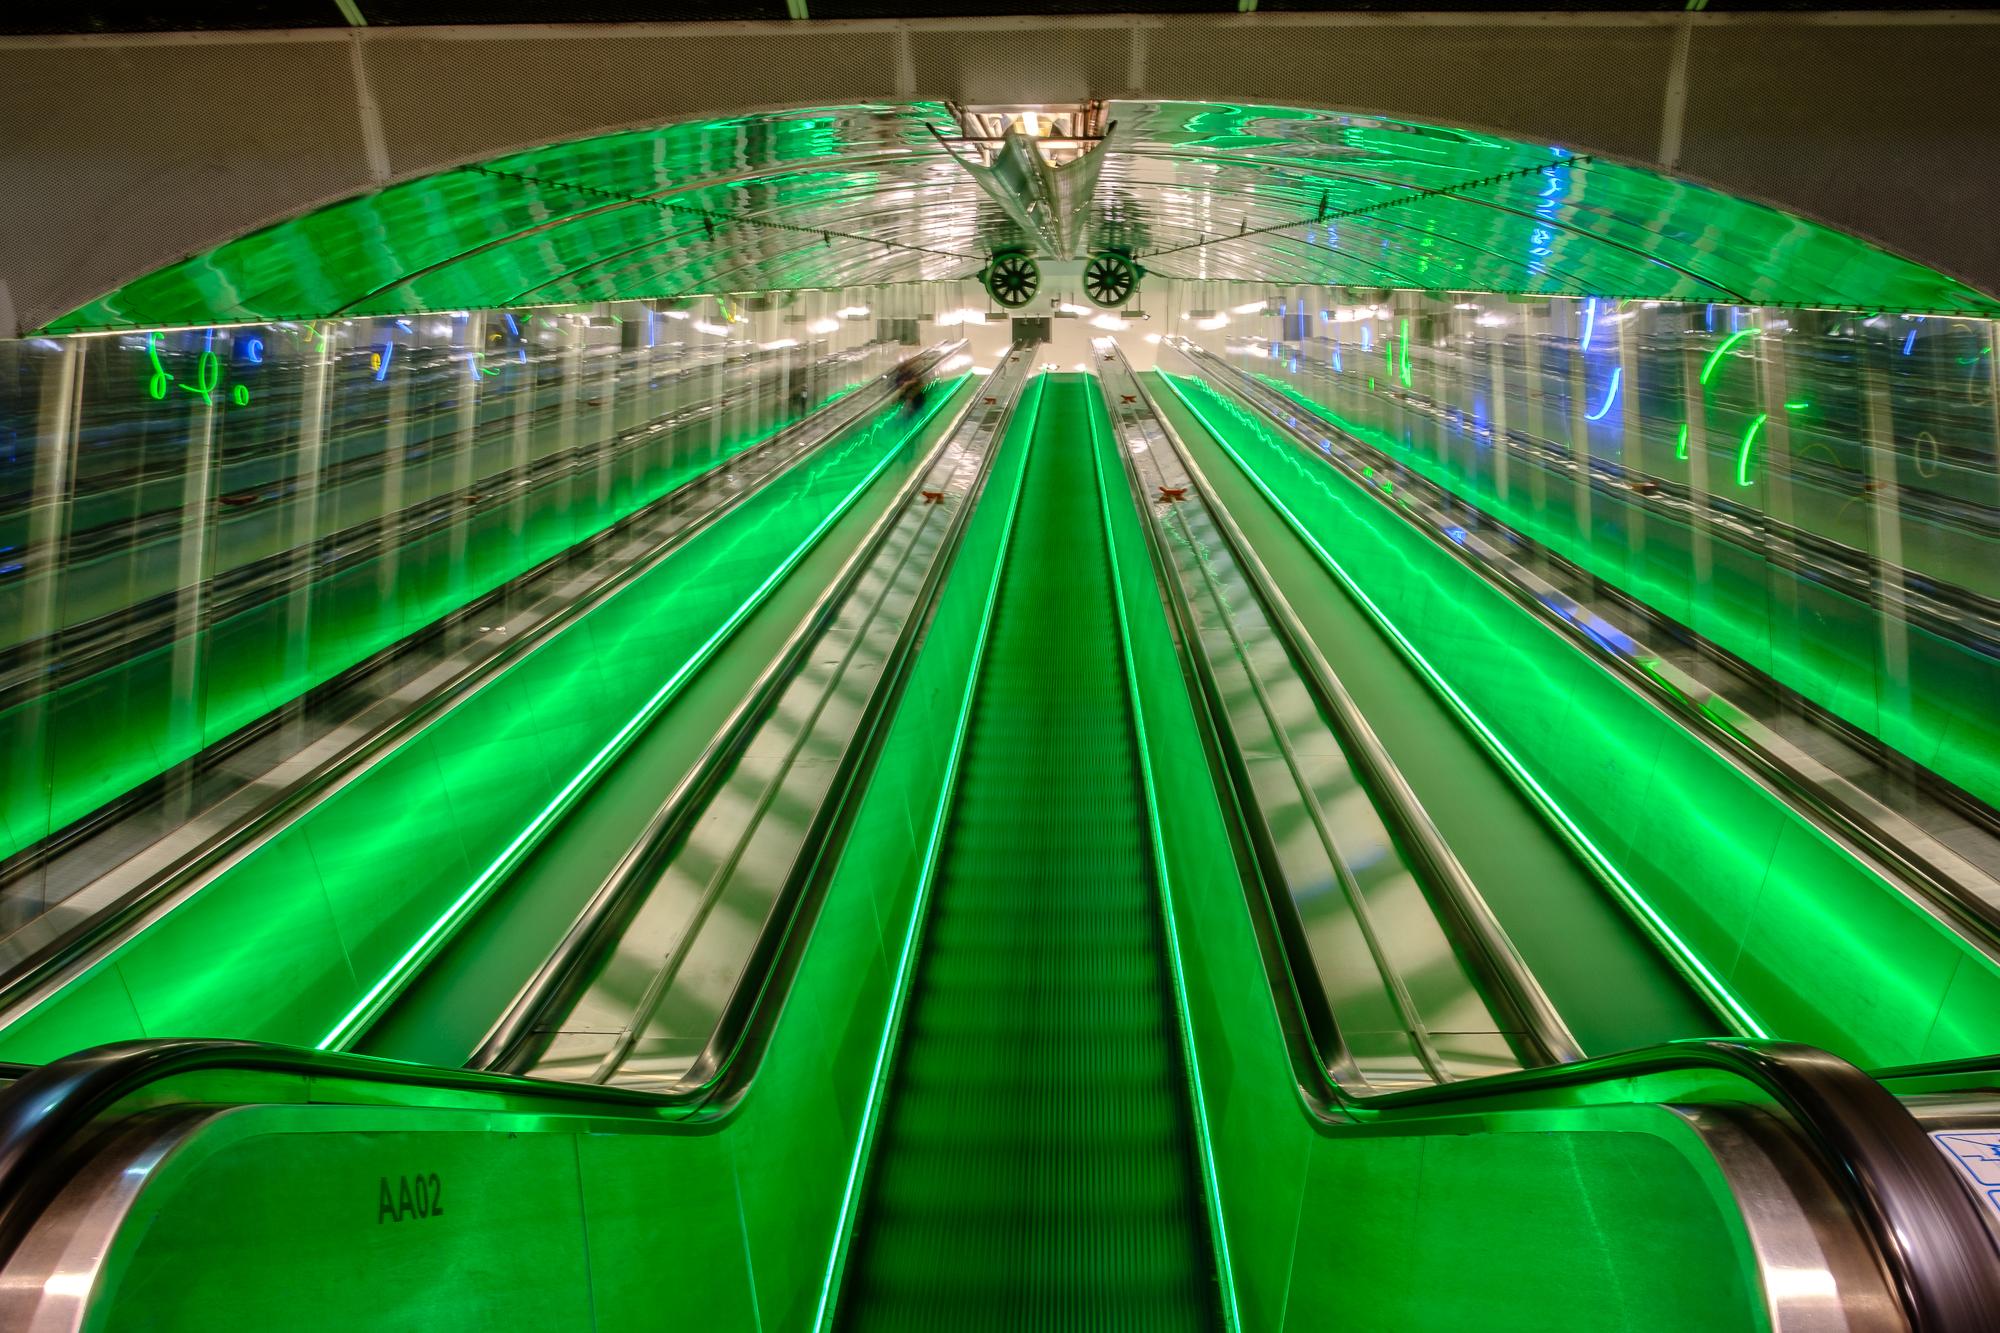 Yliopisto Metro Station, Finland